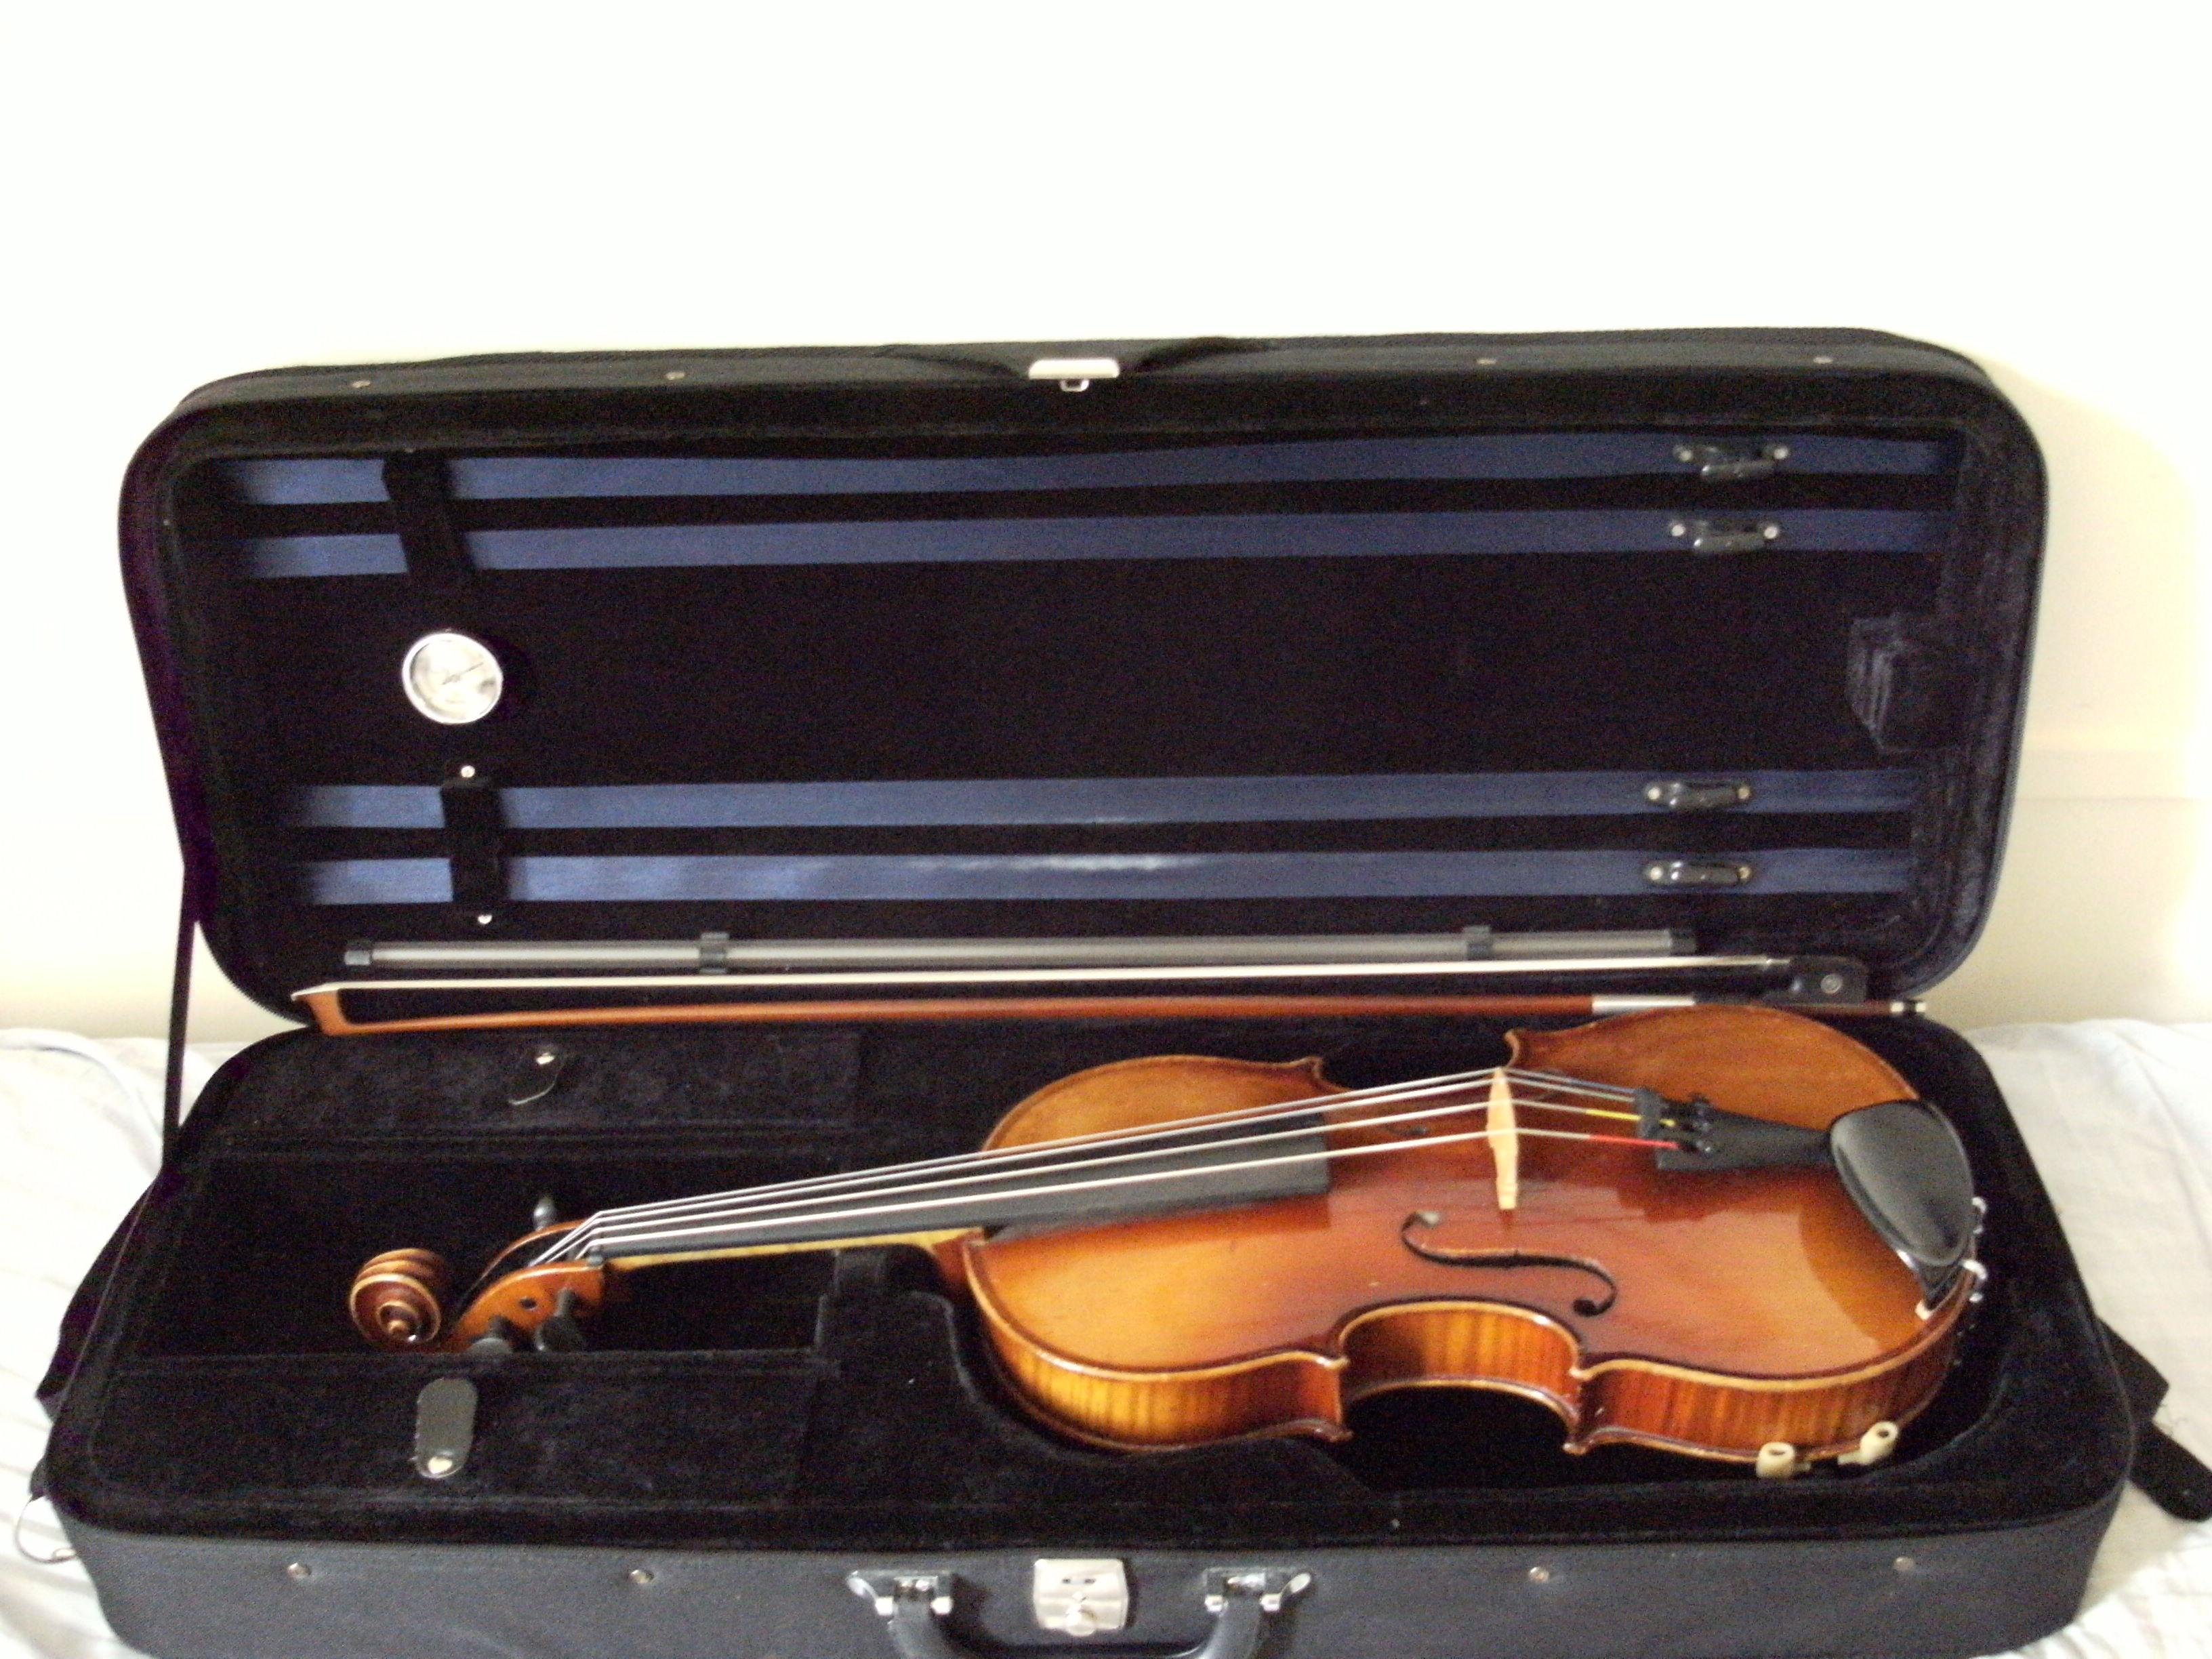 Martin Ash's viola